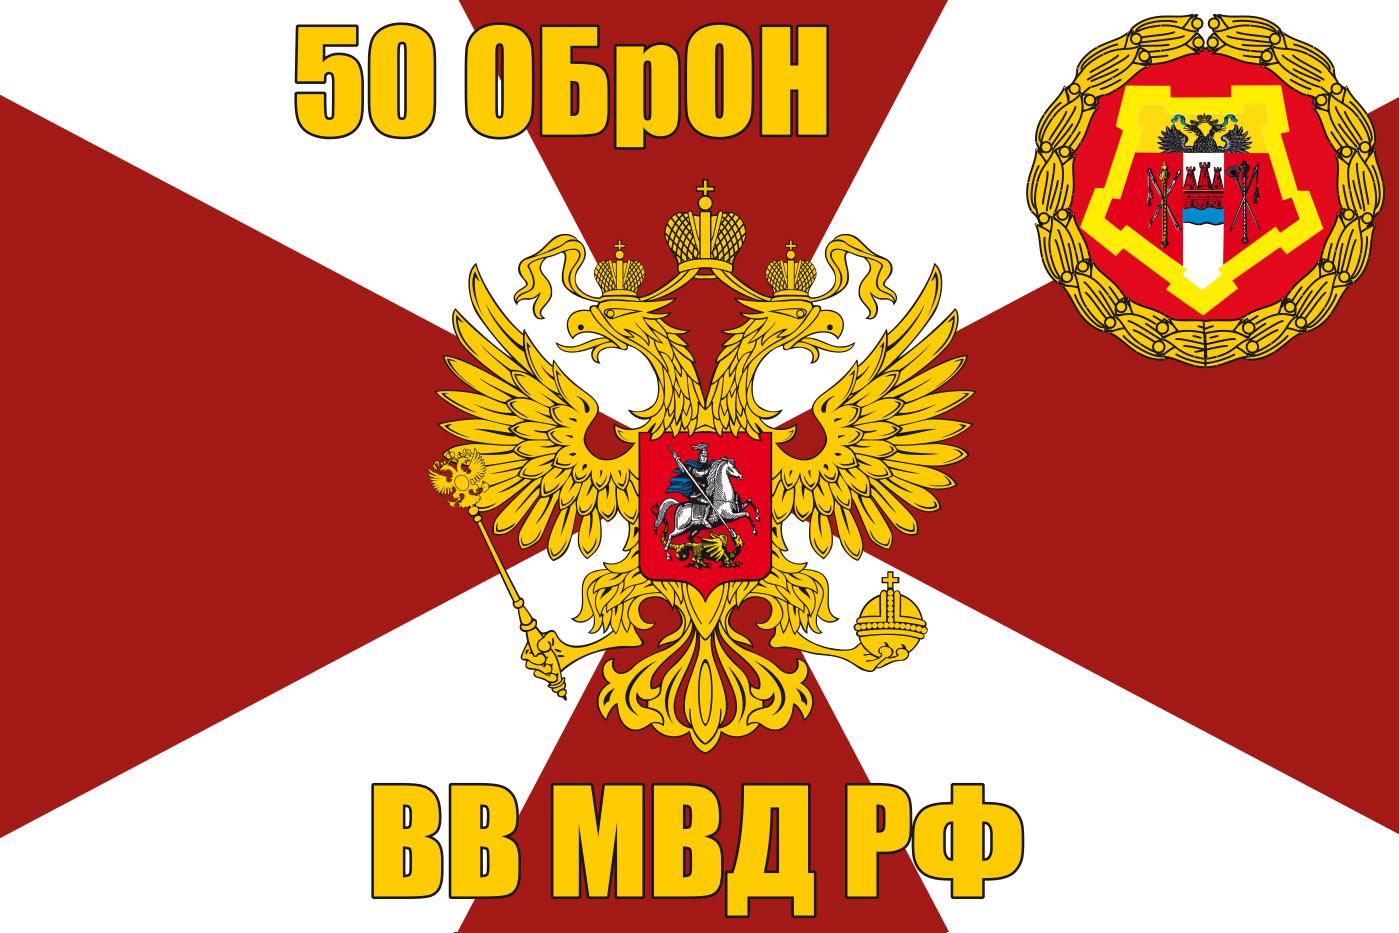 Флаг 50 ОБрОН ВВ МВД РФ